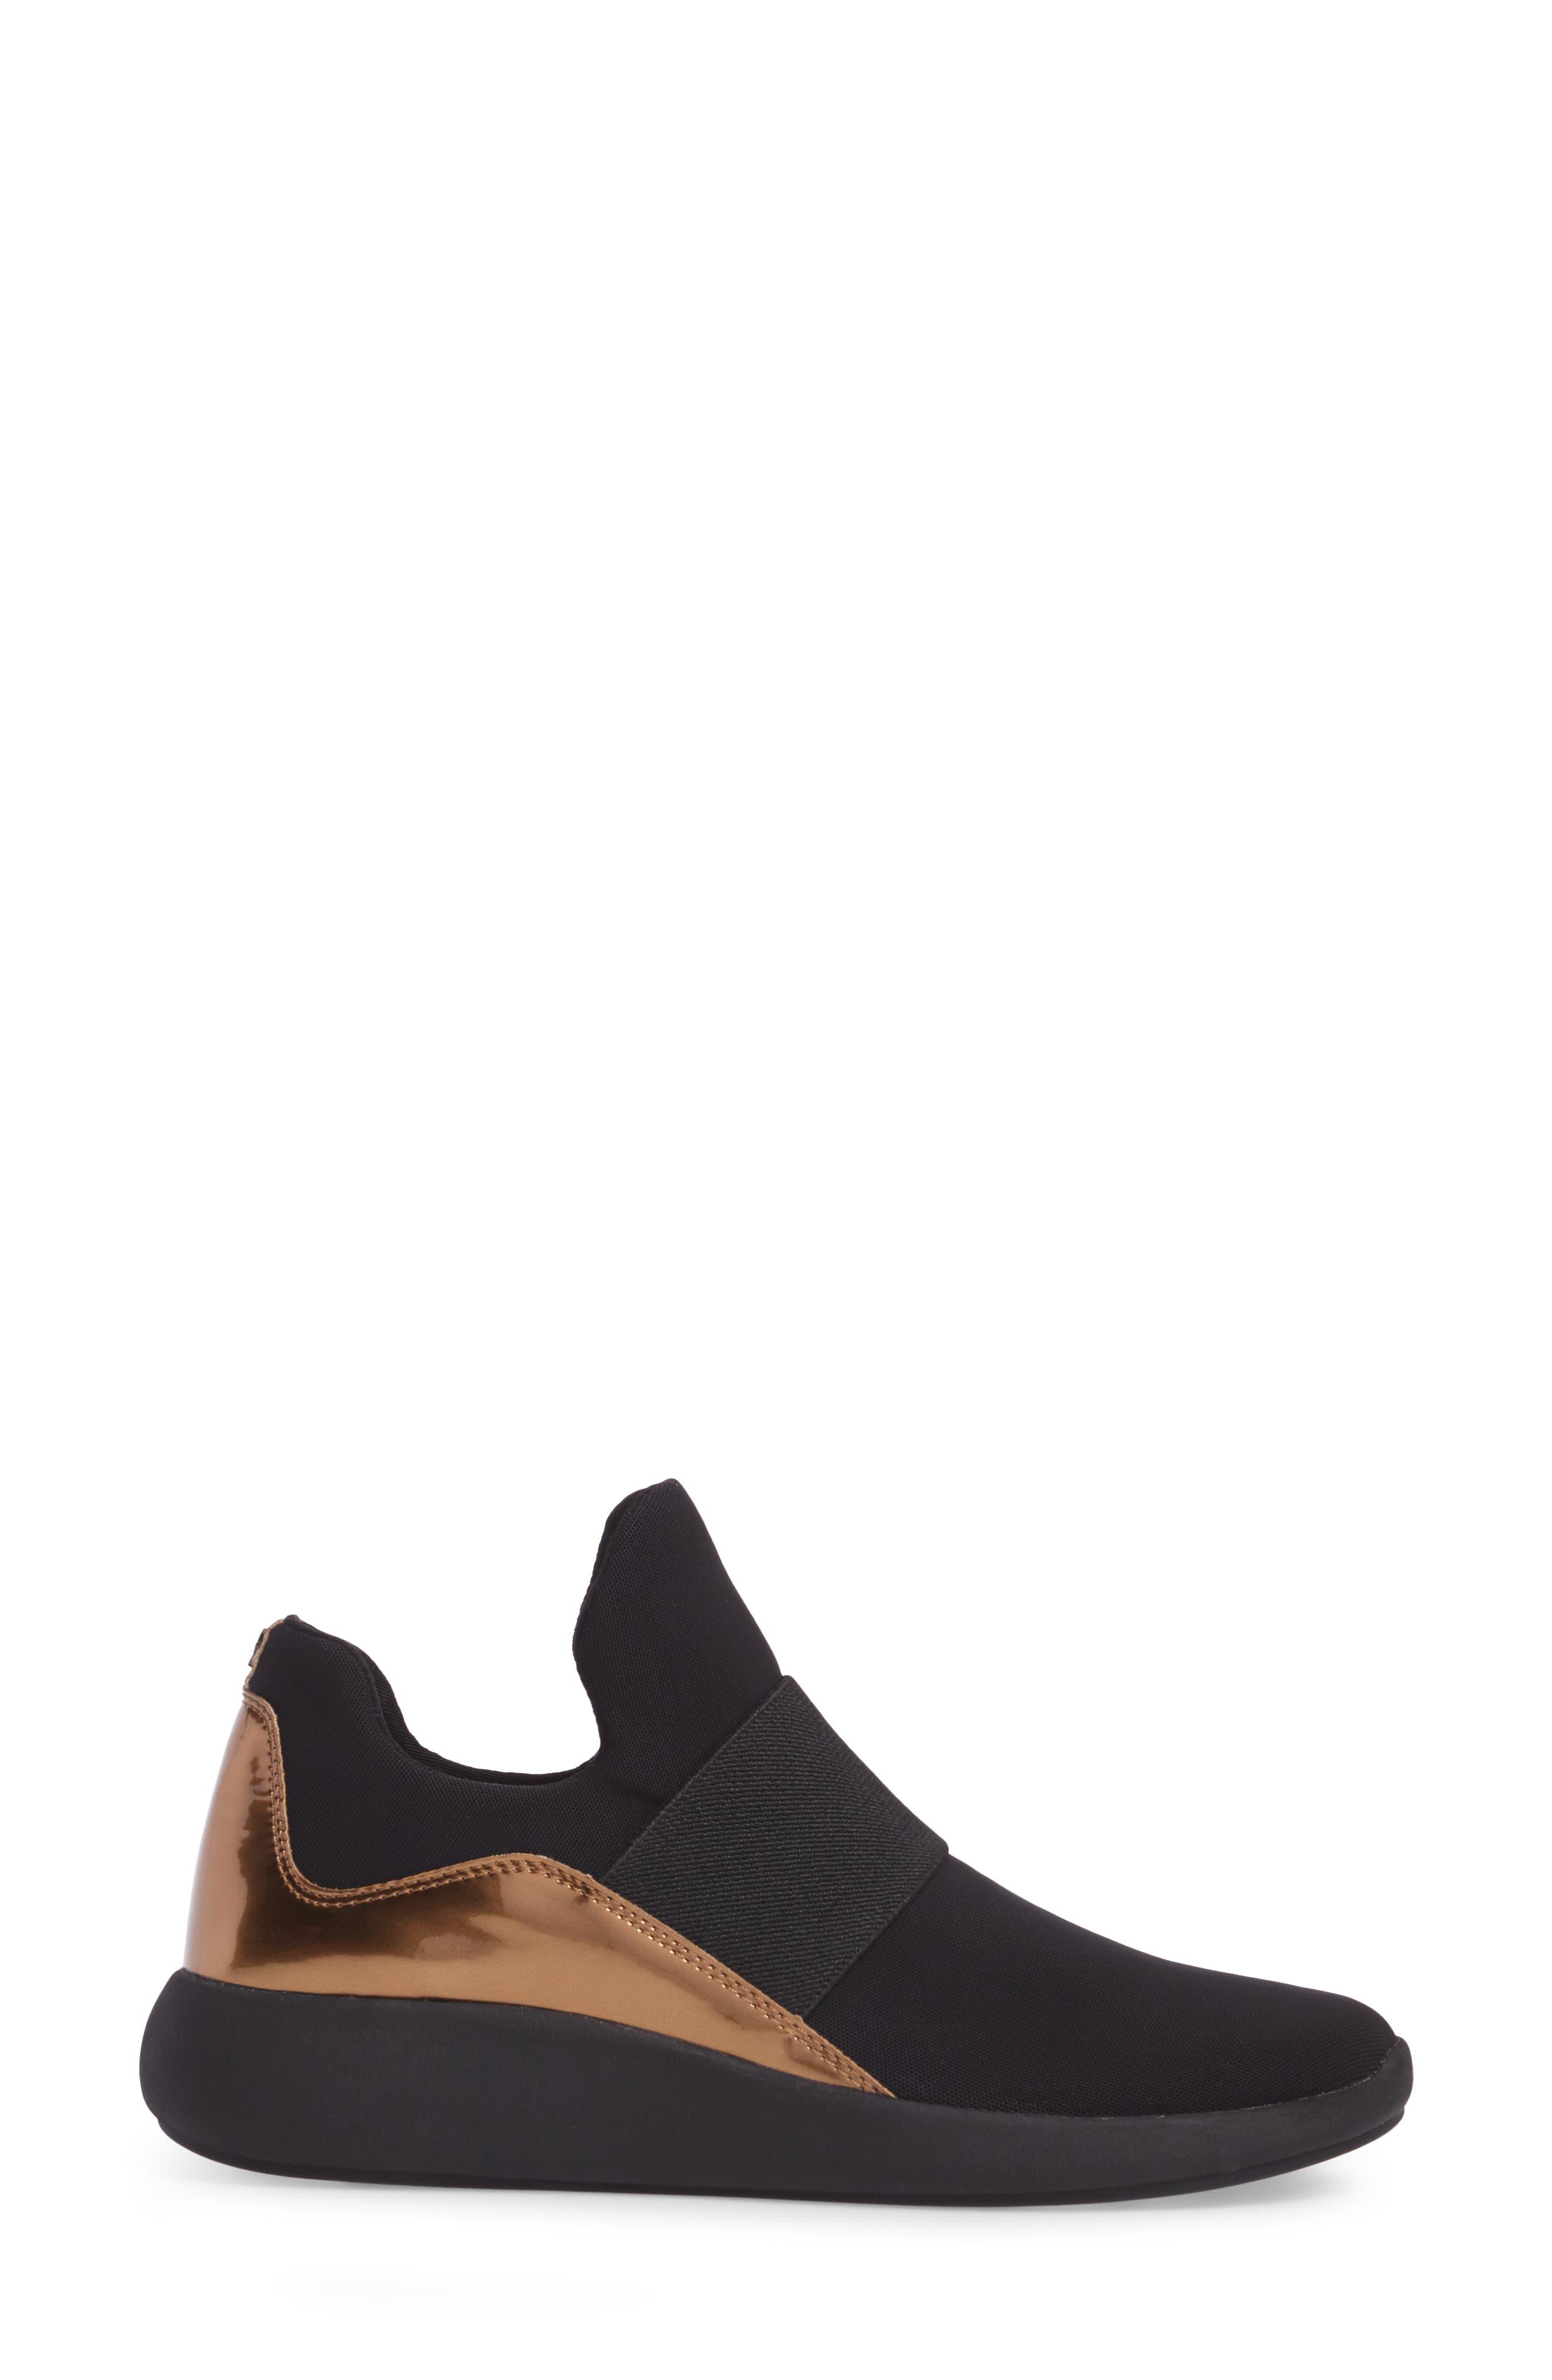 Alternate Image 3  - Donna Karan Cory Slip-On Sneaker (Women)